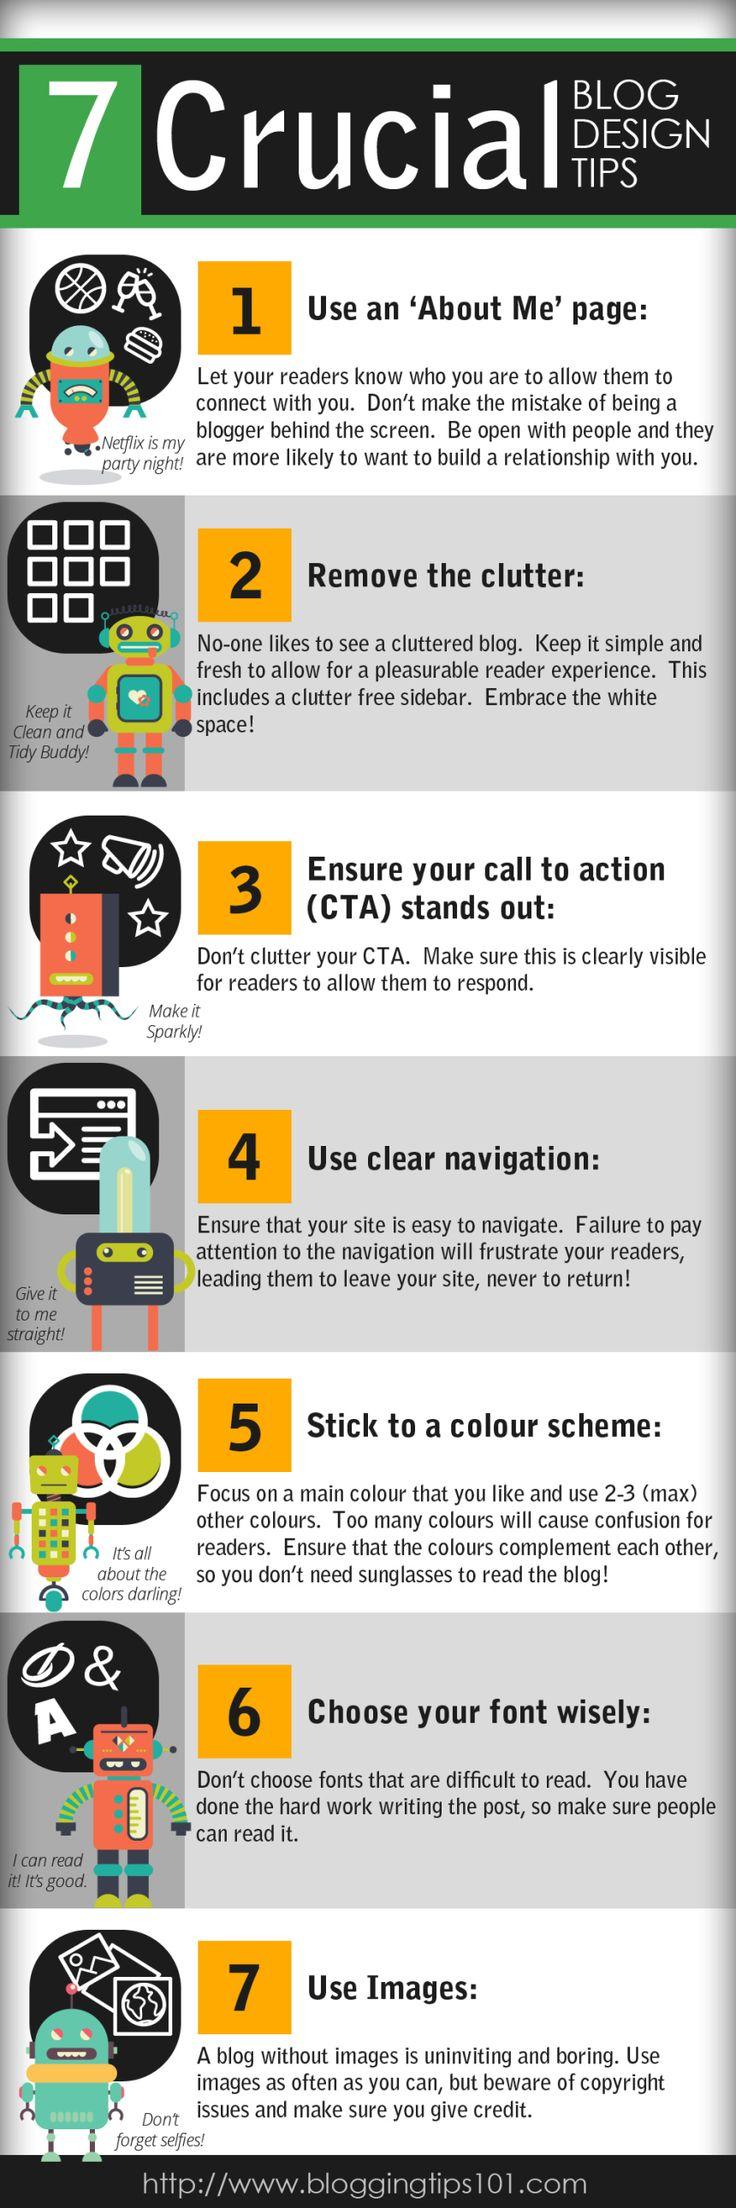 7 consejos cruciales sobre diseño para tu blog #infografia #infographic #design vía: http://bloggingtips101.com